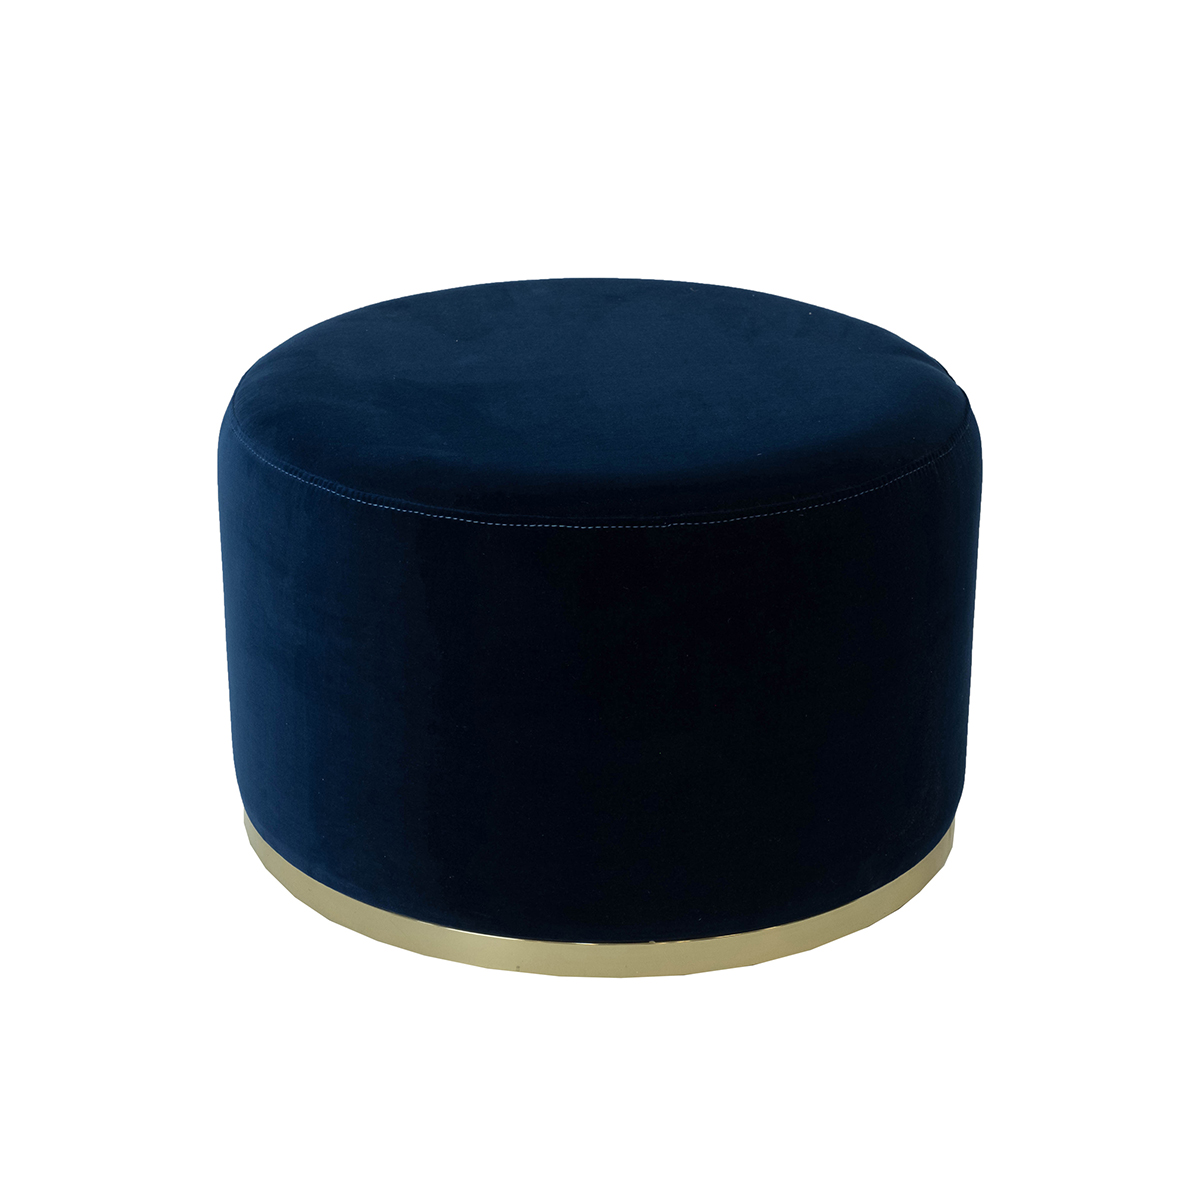 Cara Ottoman – Midnight Blue